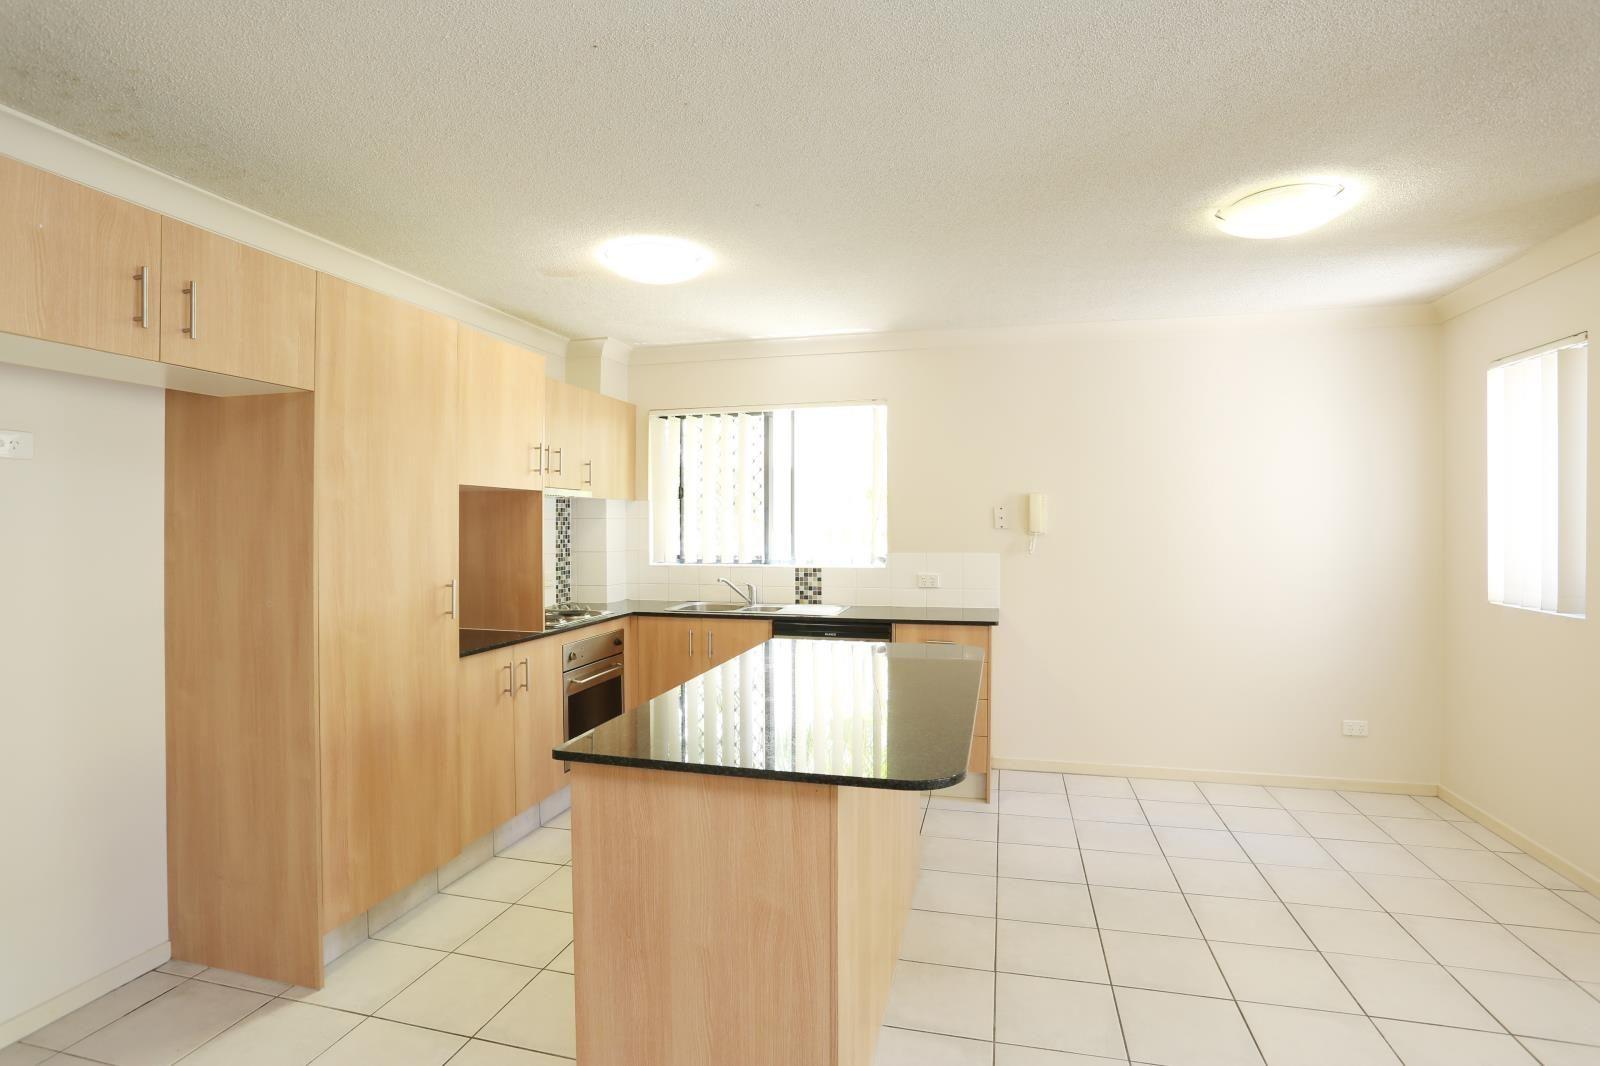 5/46-48 Lennerberg Street, Southport QLD 4215, Image 1